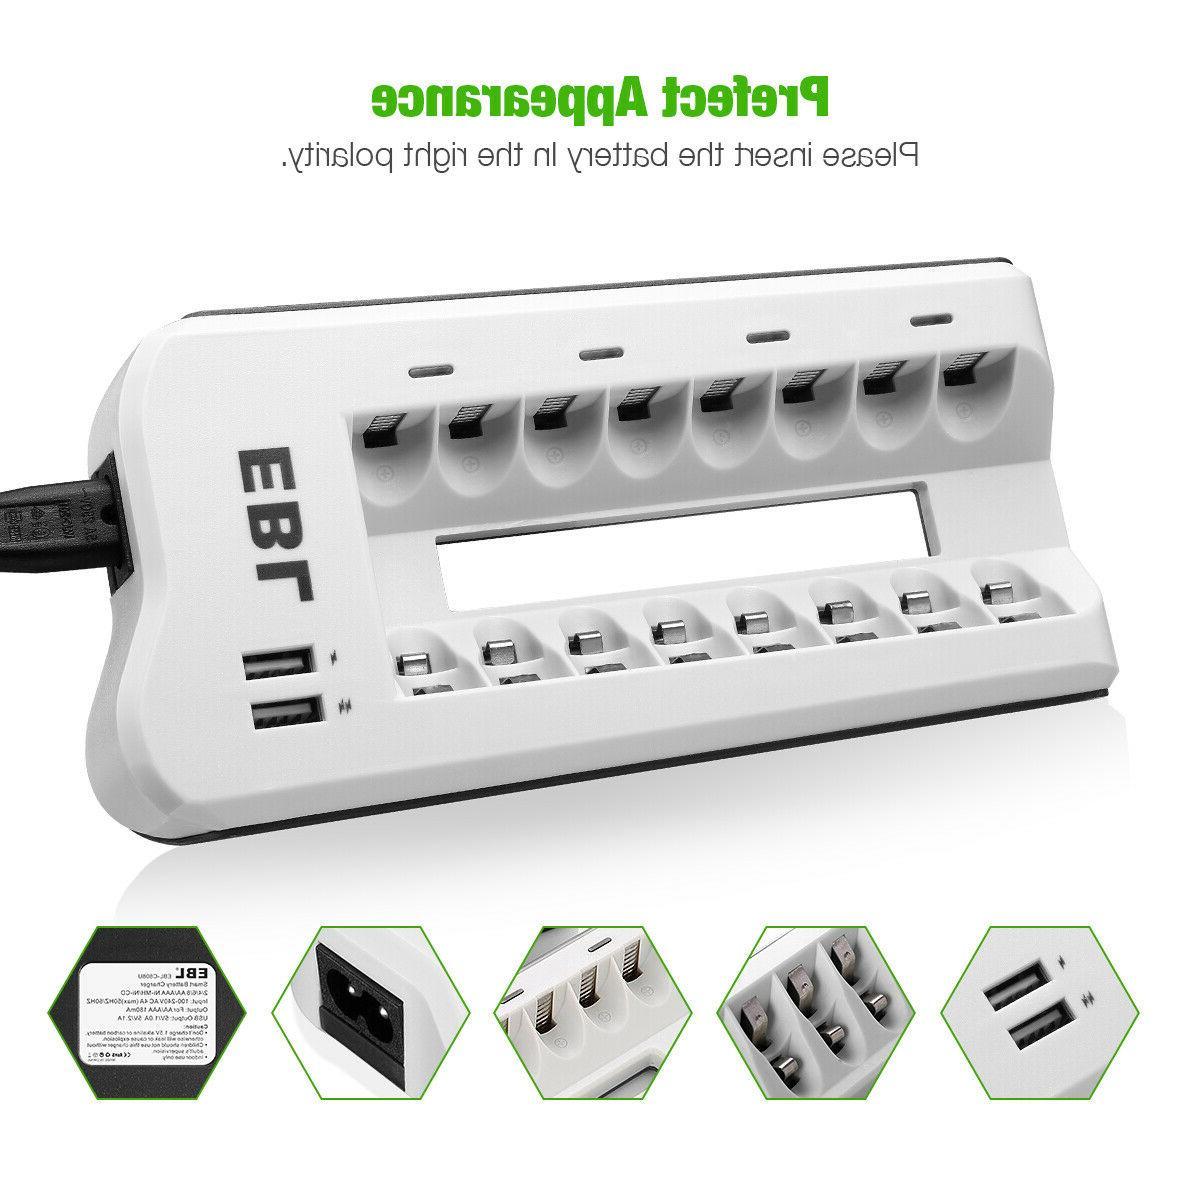 EBL / 8 Smart NI-CD Rechargeable